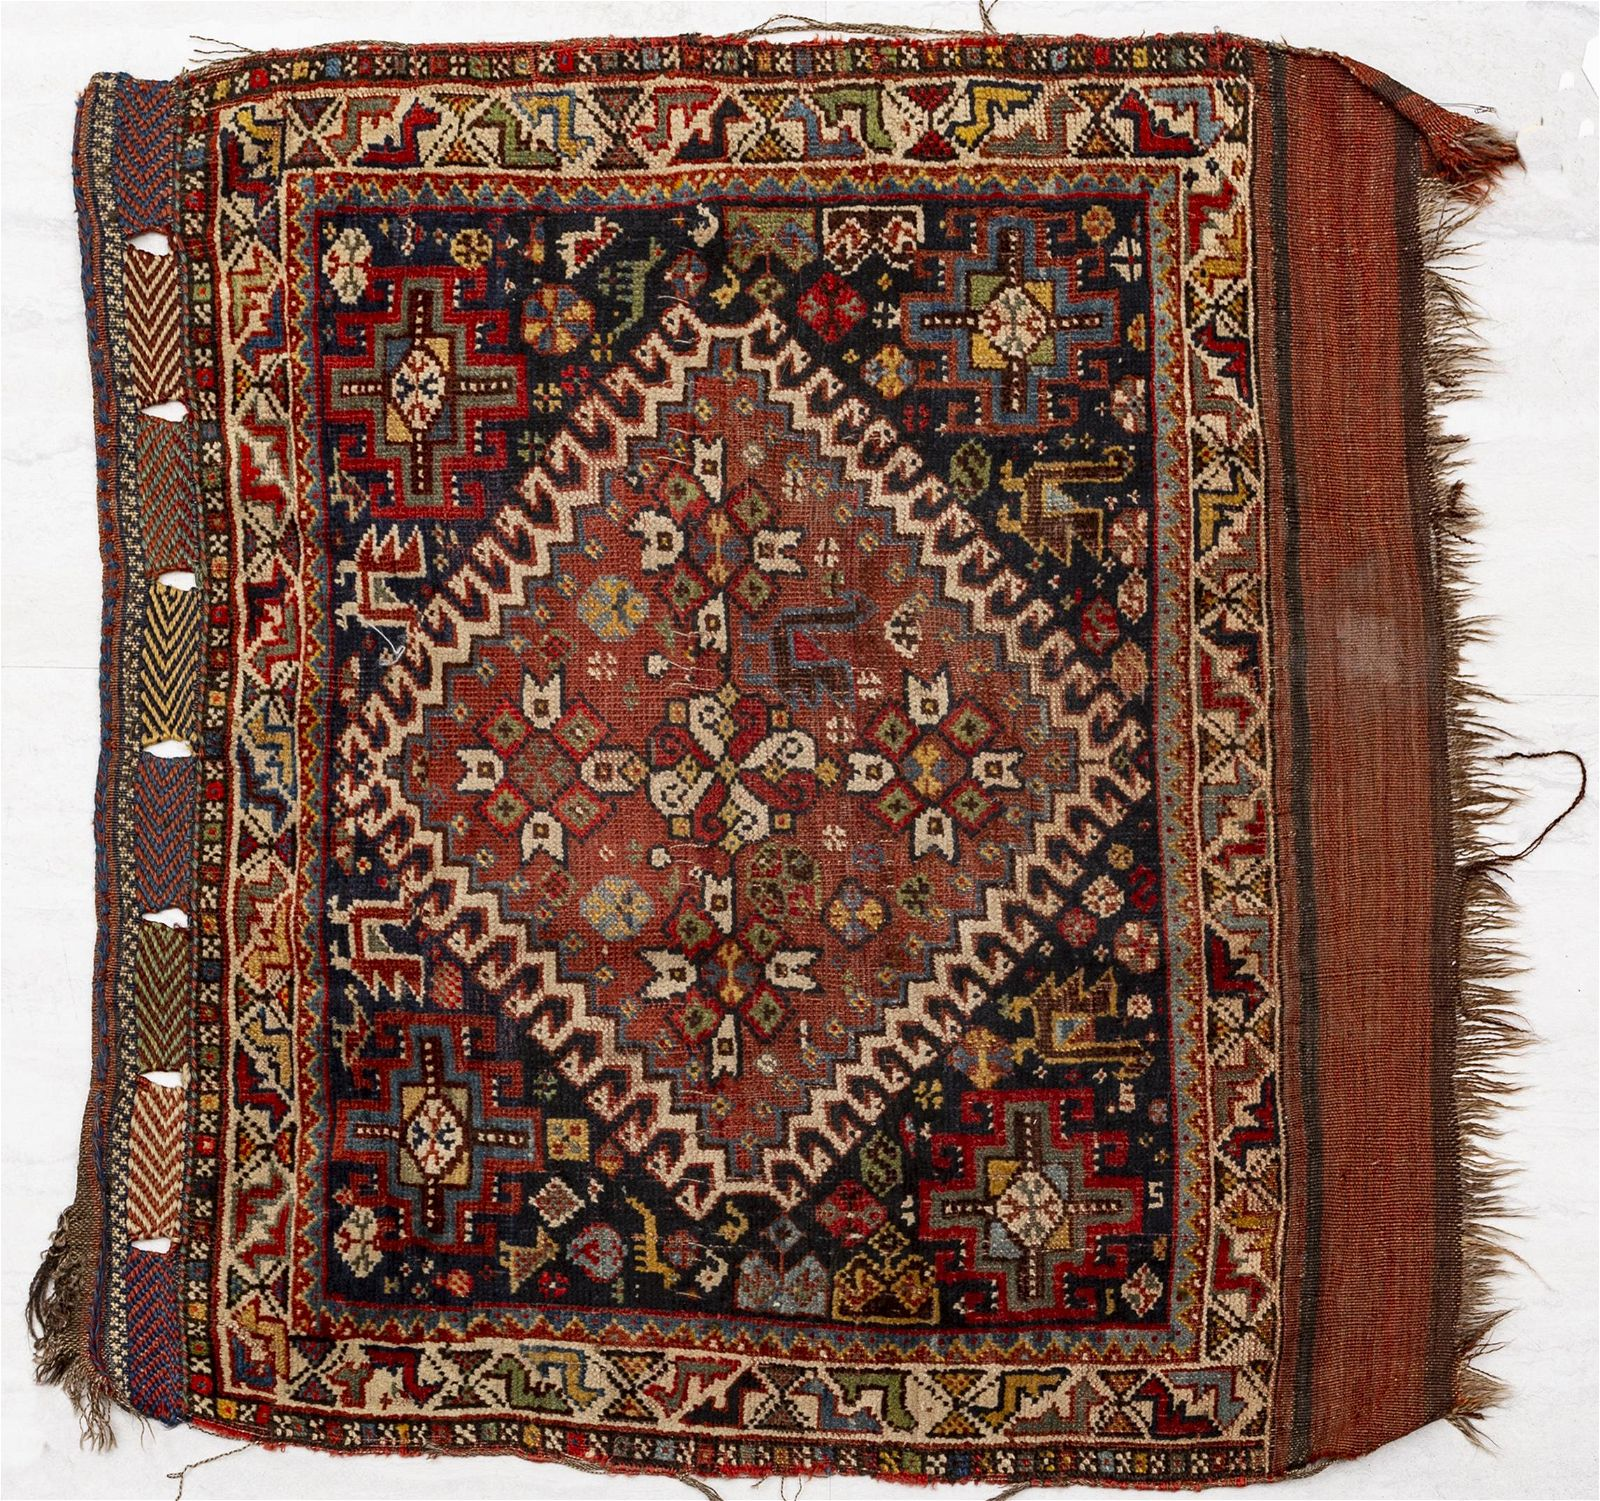 ANTIQUE SOUTHWEST PERSIAN KHAMSEH WOOL BAG FACE